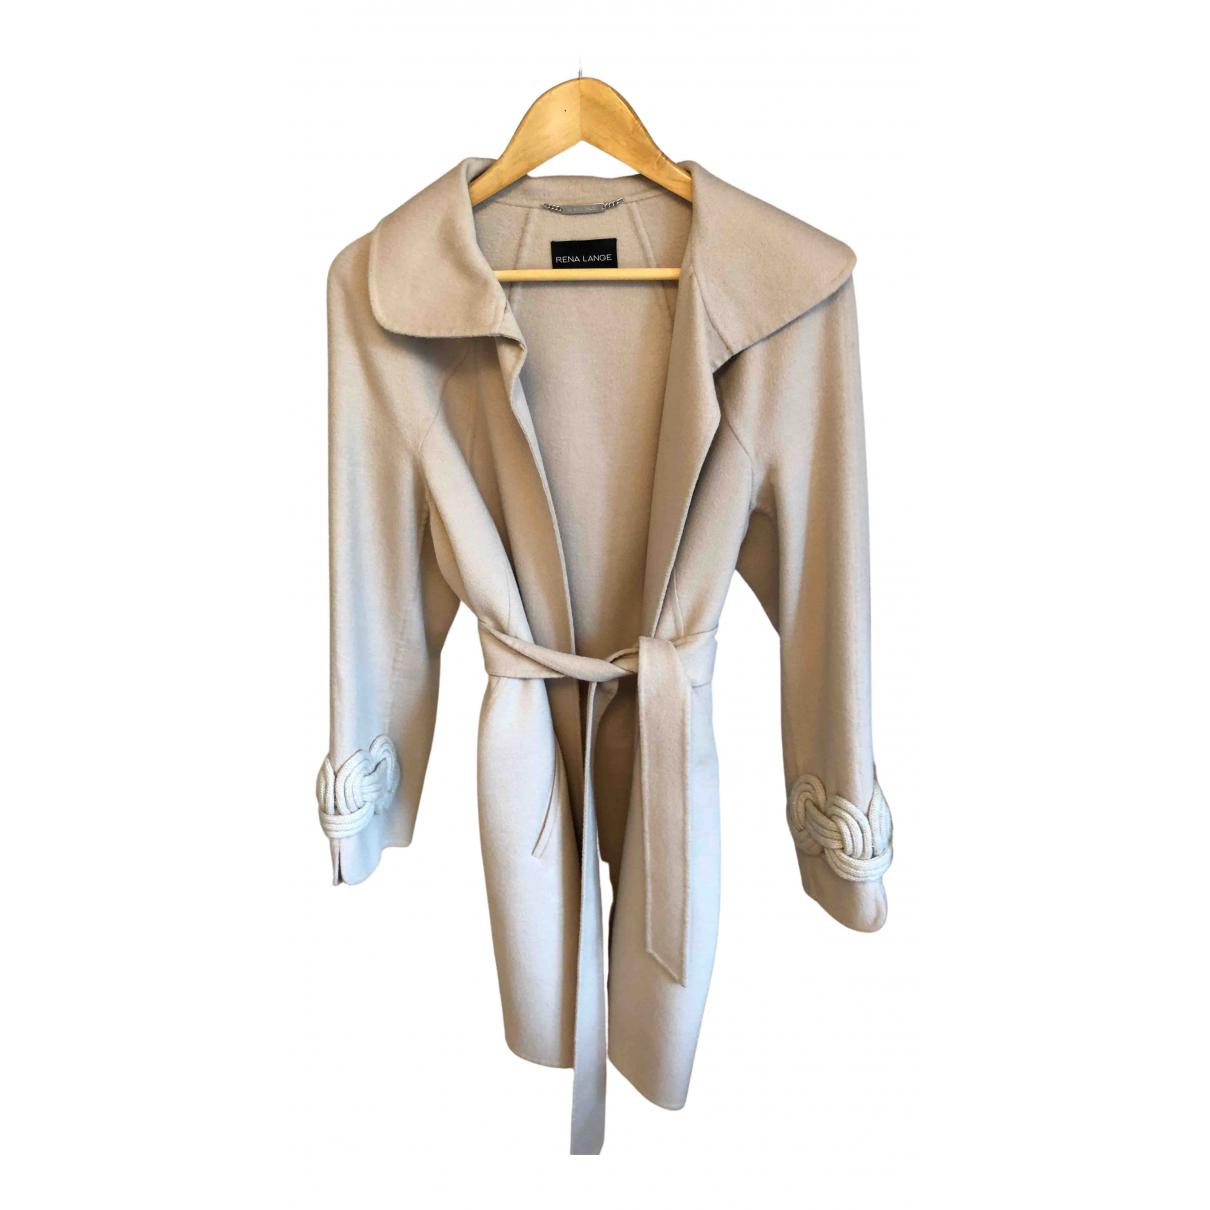 Rena Lange \N Beige Wool coat for Women 6 US